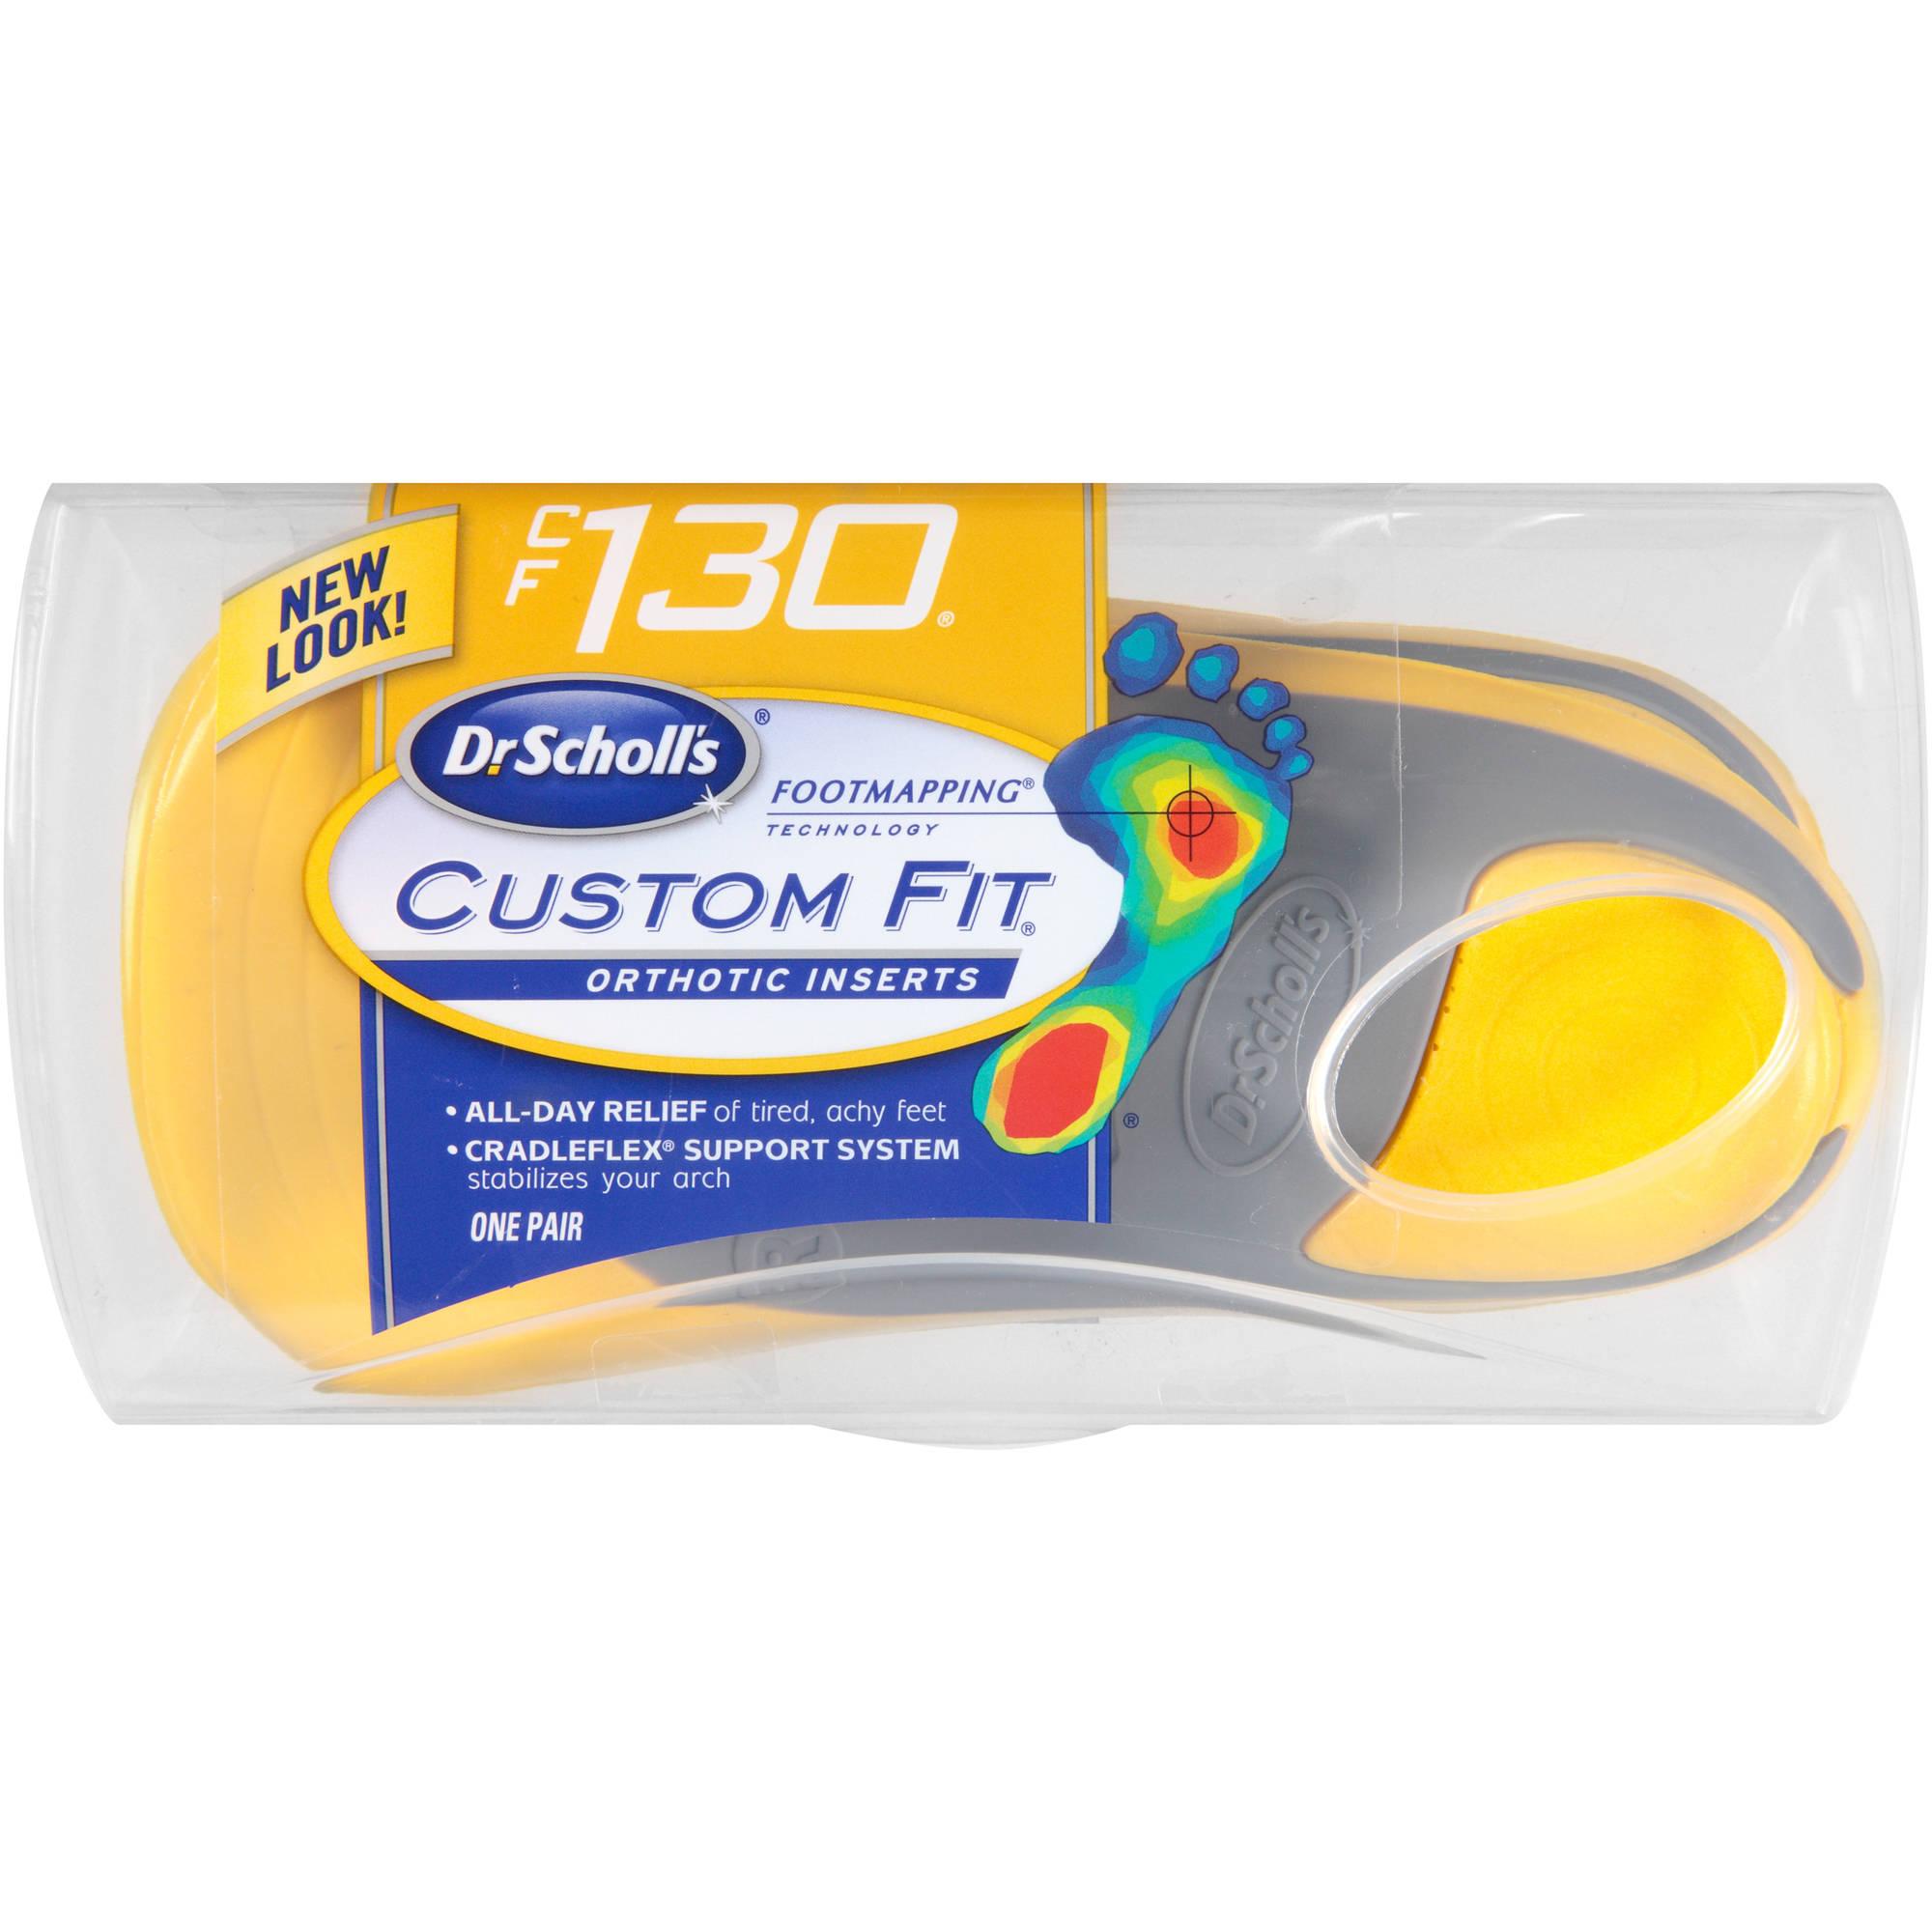 Dr Scholl's Custom Fit CF130 Orthotic Inserts, 1 pr